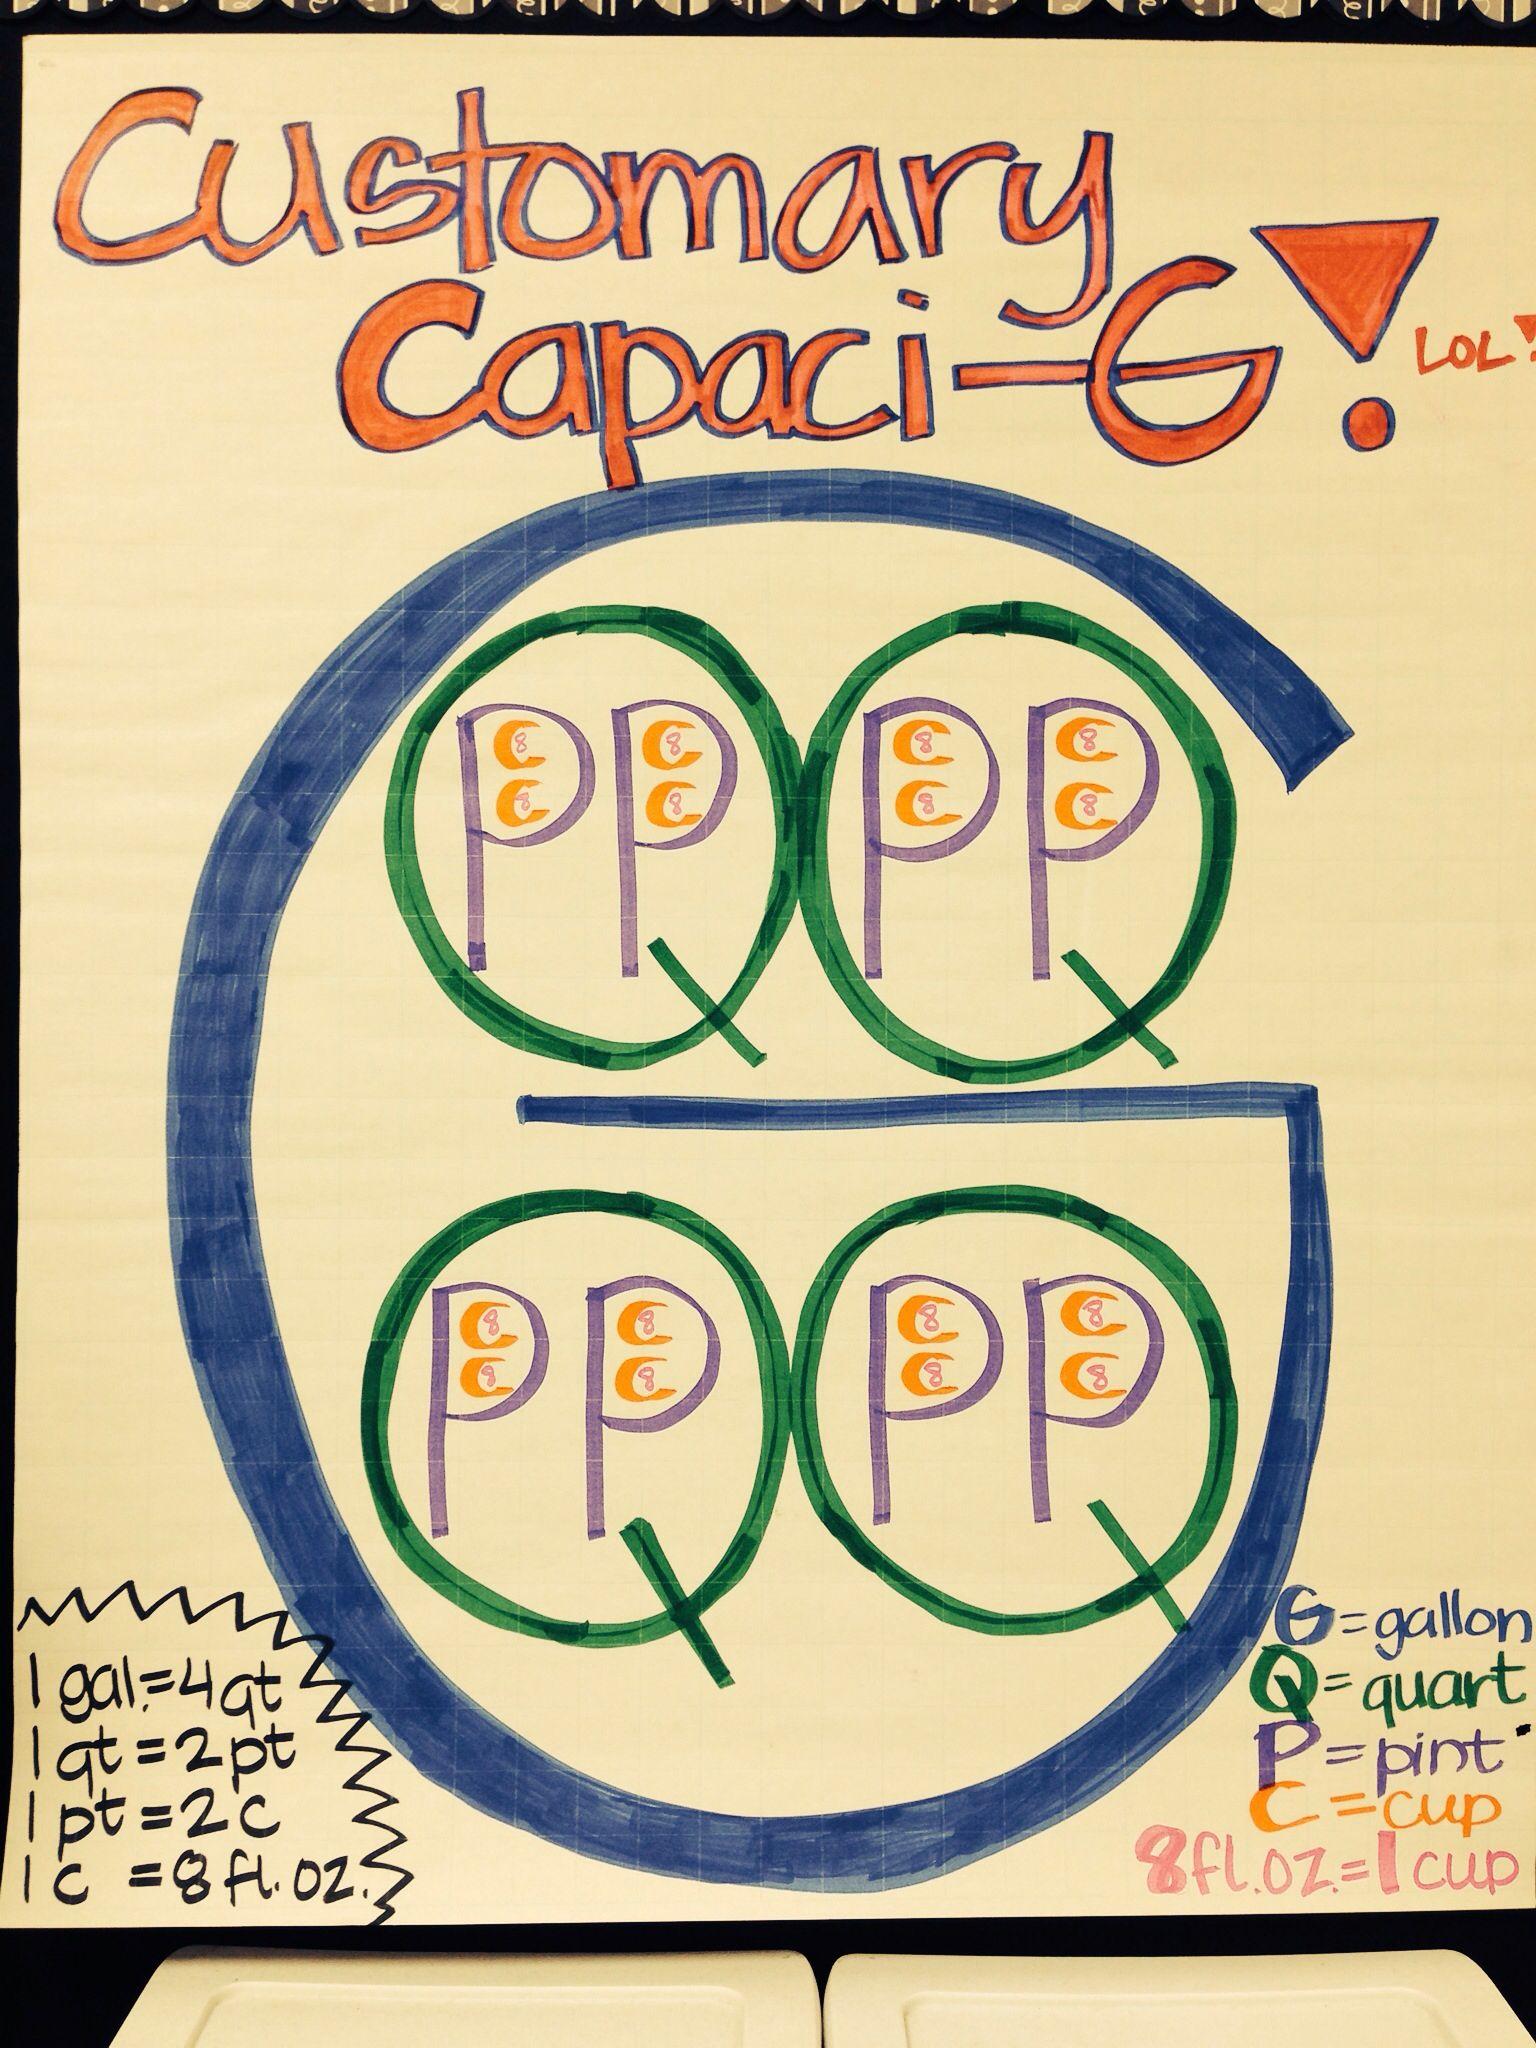 Customary Capacity  U0026quot Capaci-g U0026quot  Anchor Chart